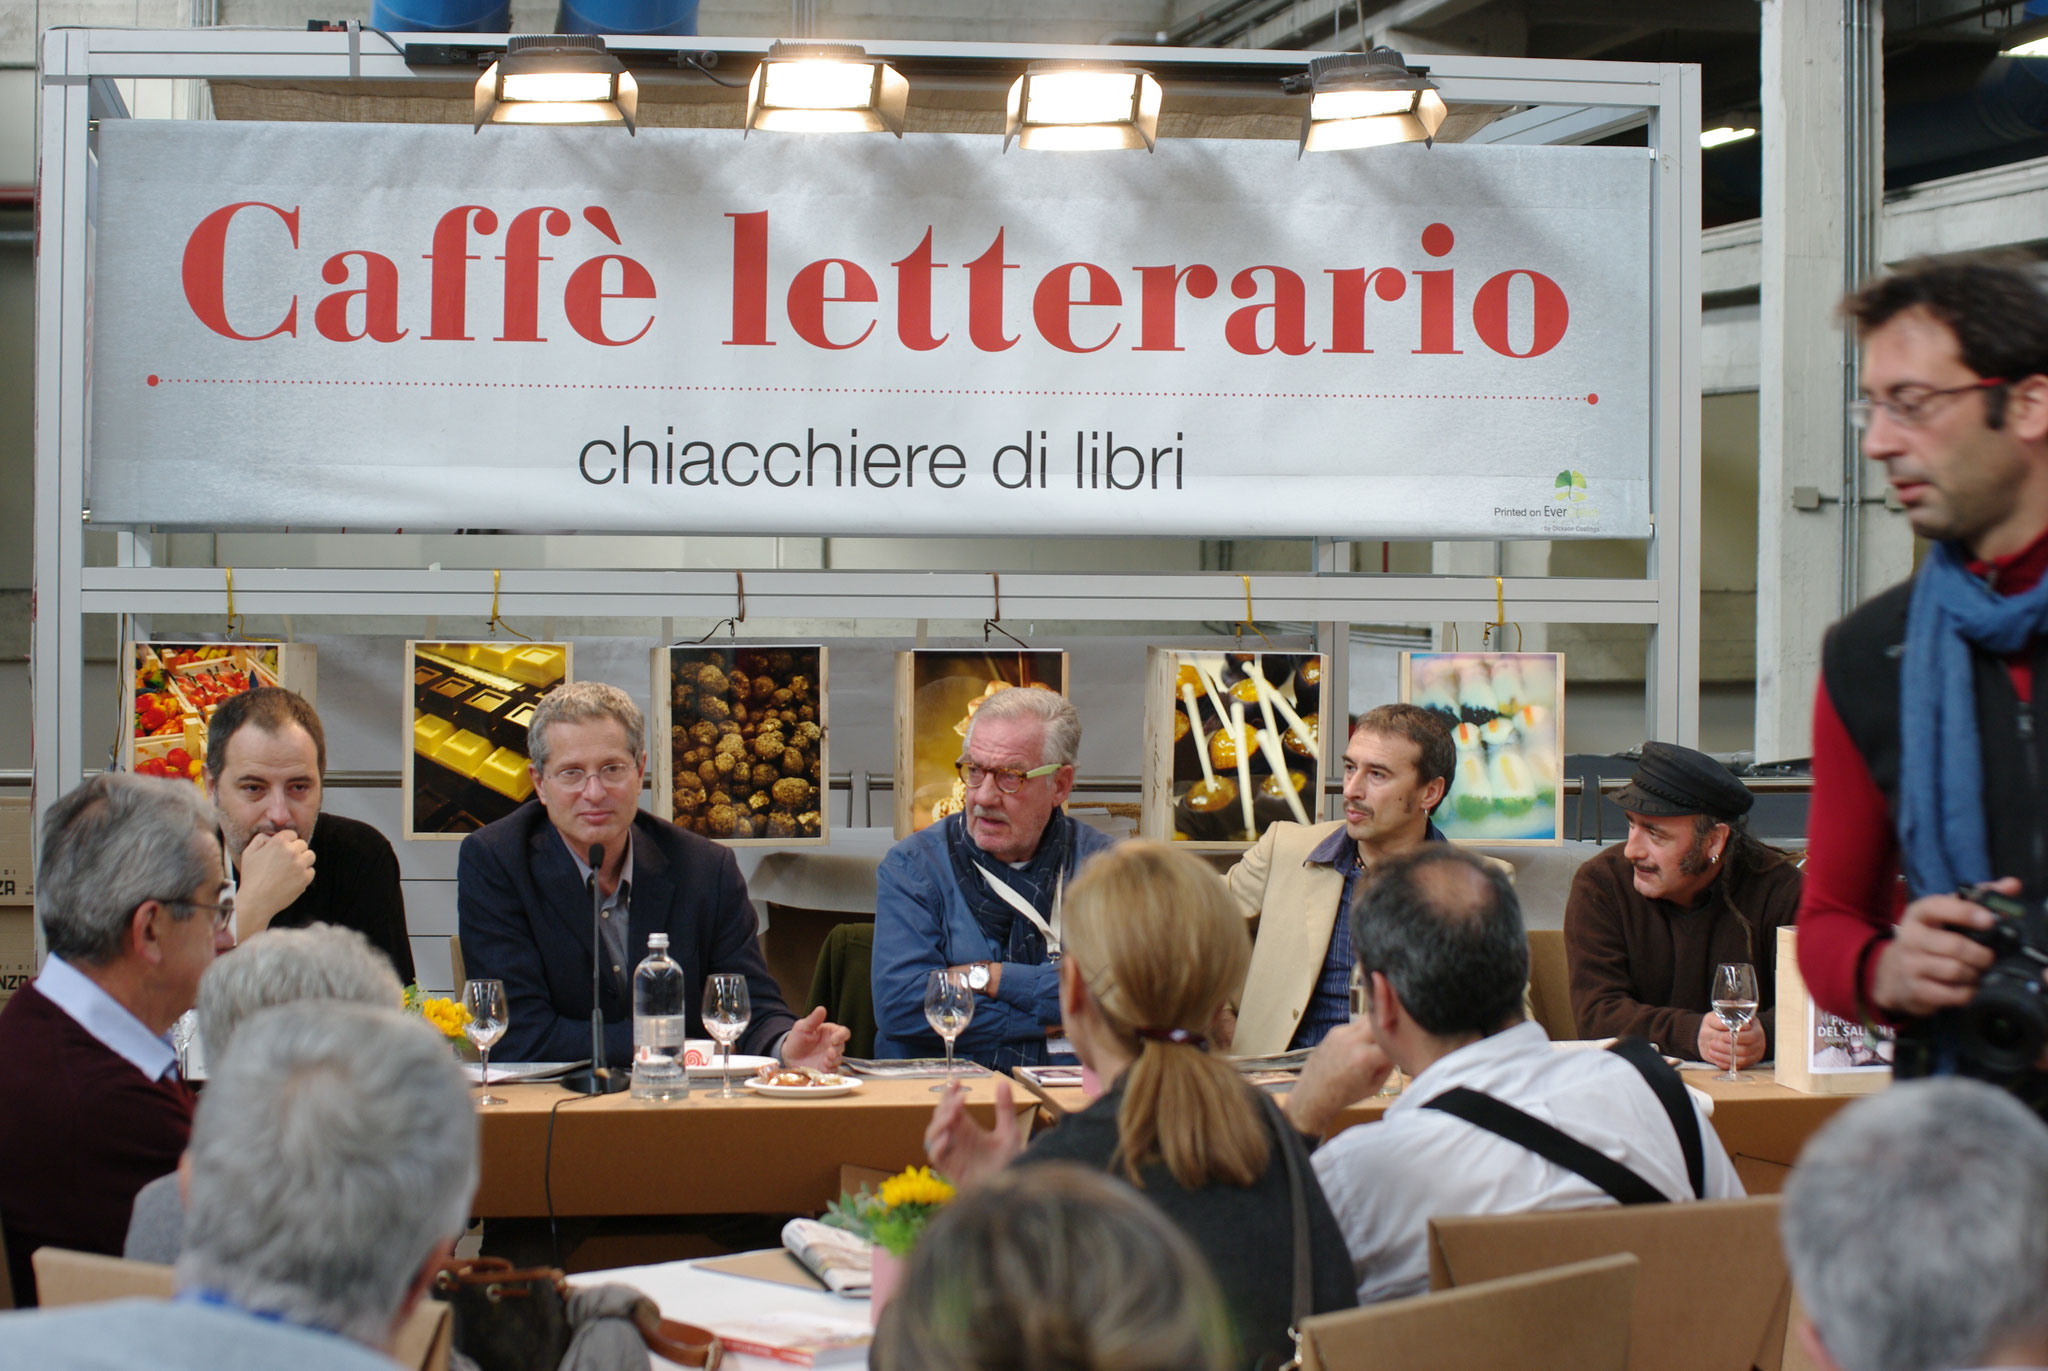 Pietro Negri, Gabriele Ferraris, Giorgio Conte, Luca Morino, Tonino Carotone